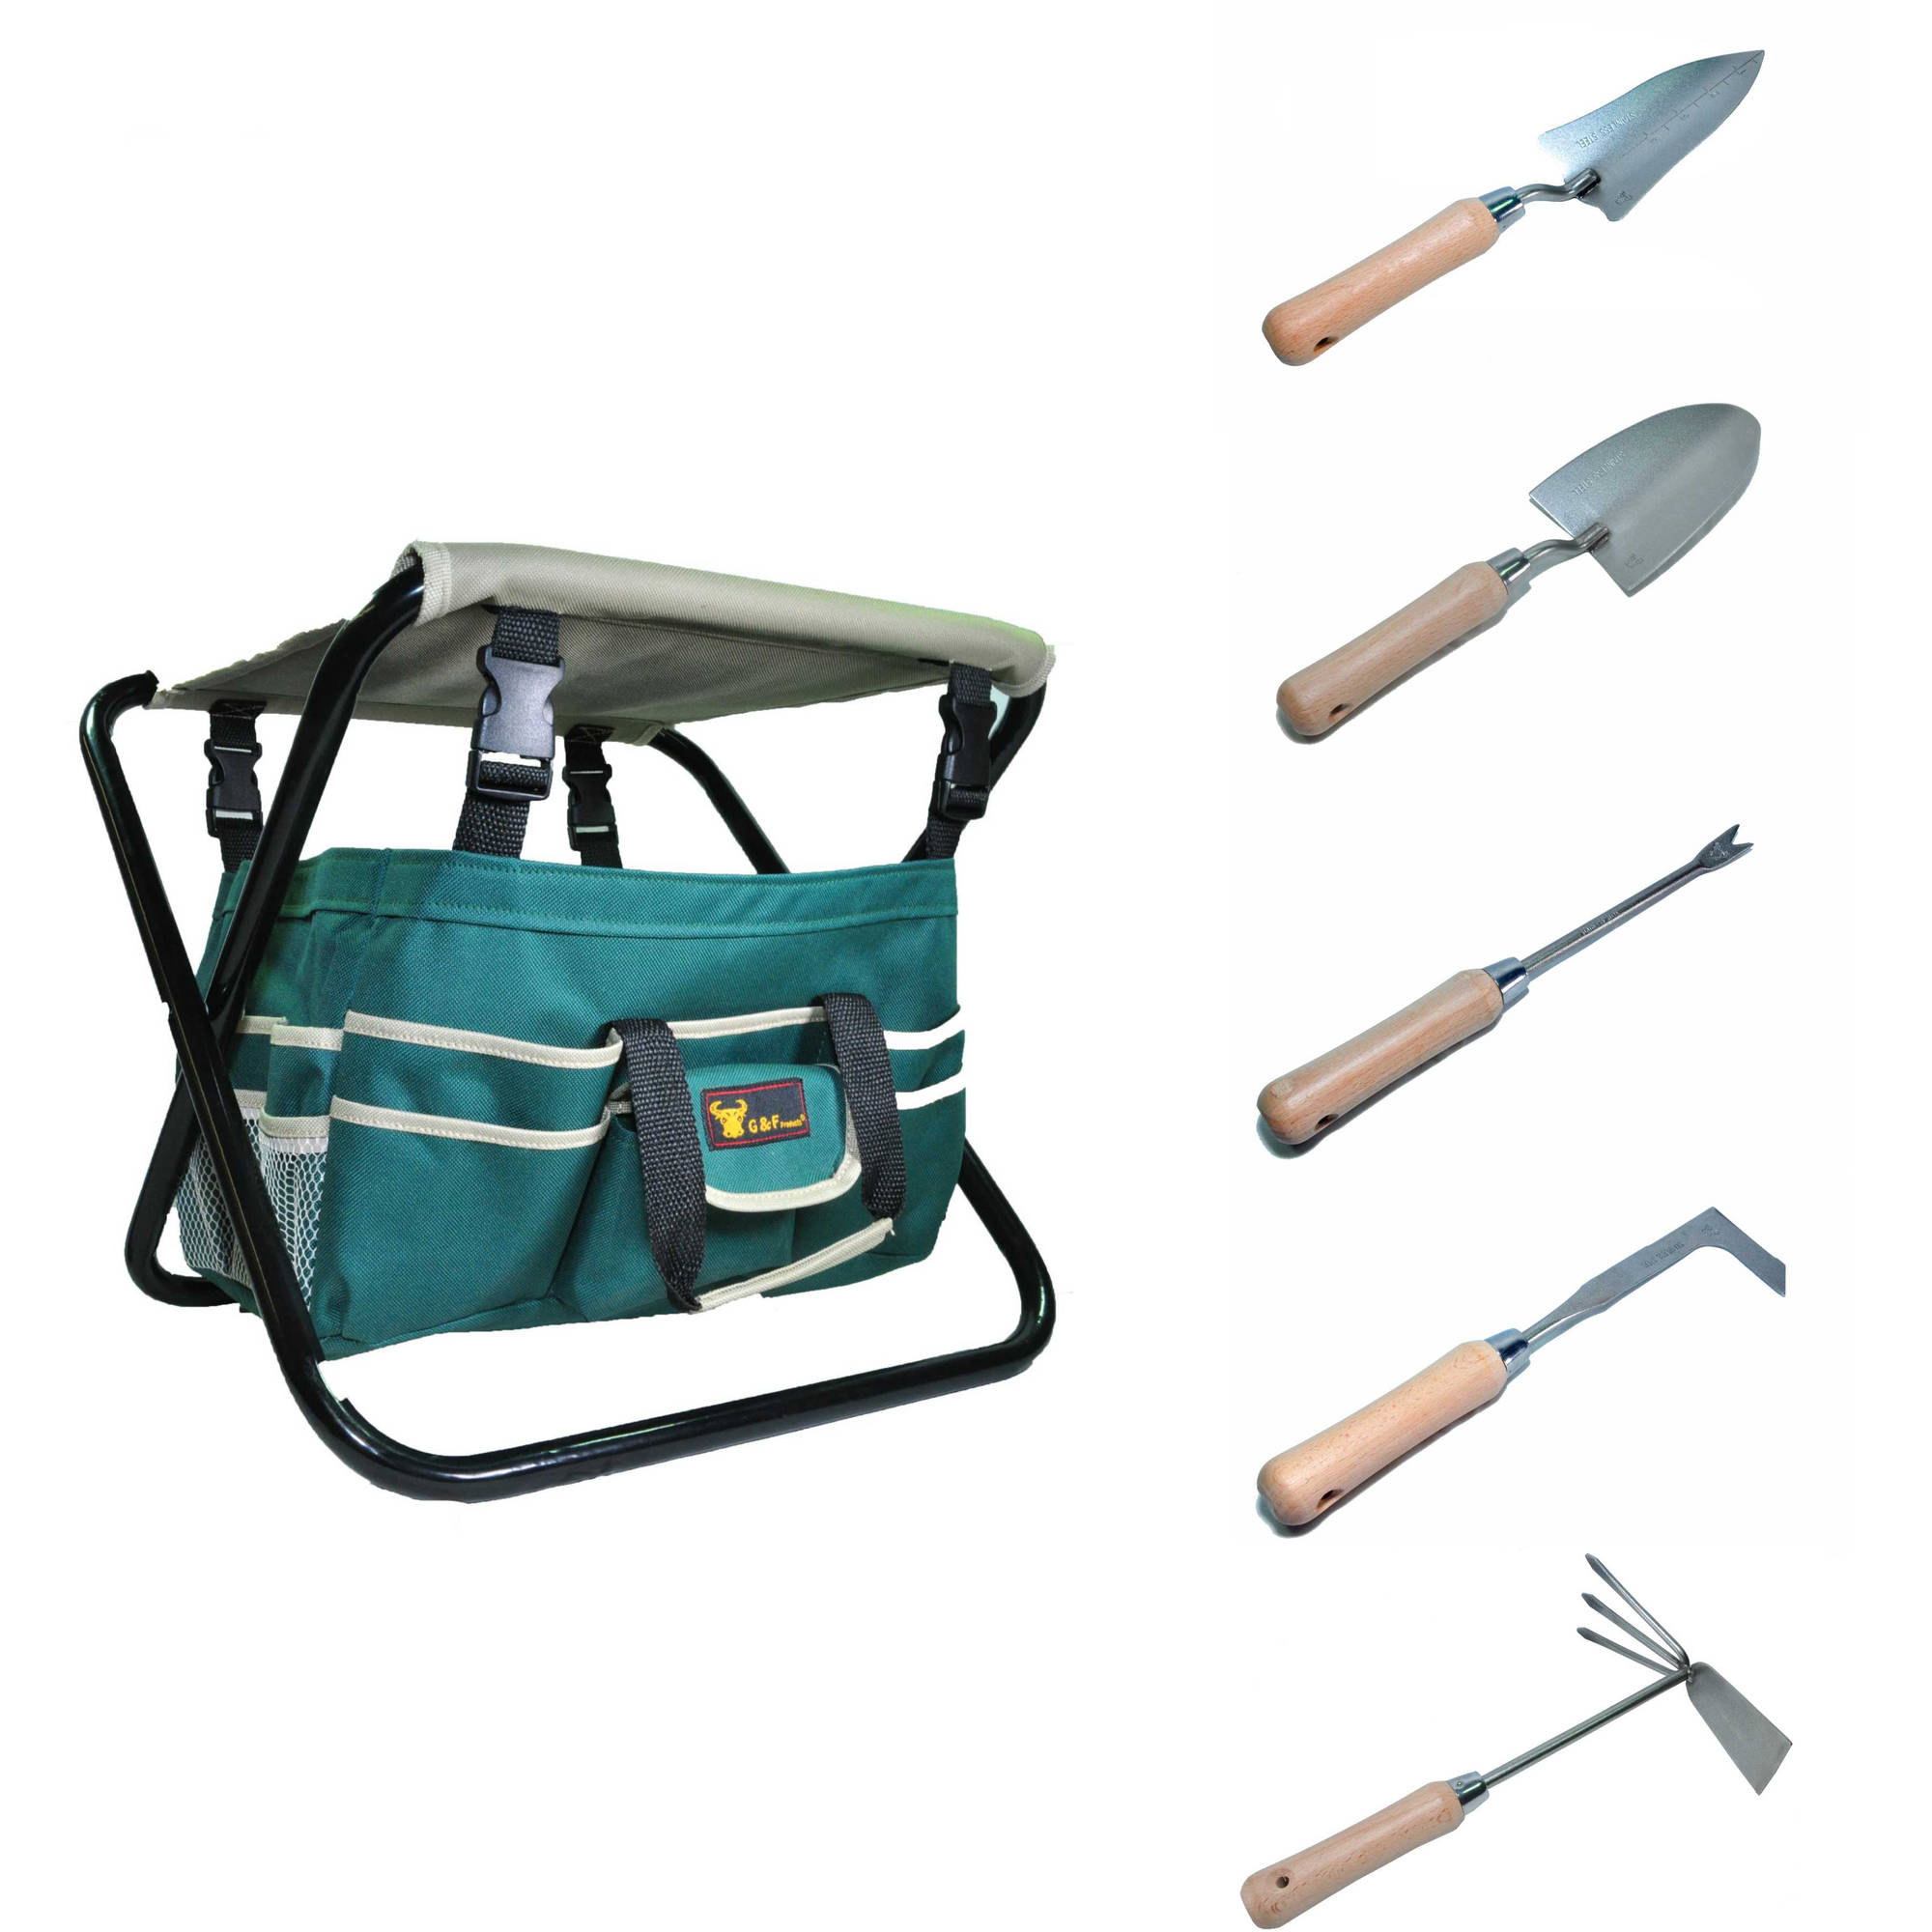 7 piece g f garden tool set at walmart ben 39 s bargains for Gardening tools walmart